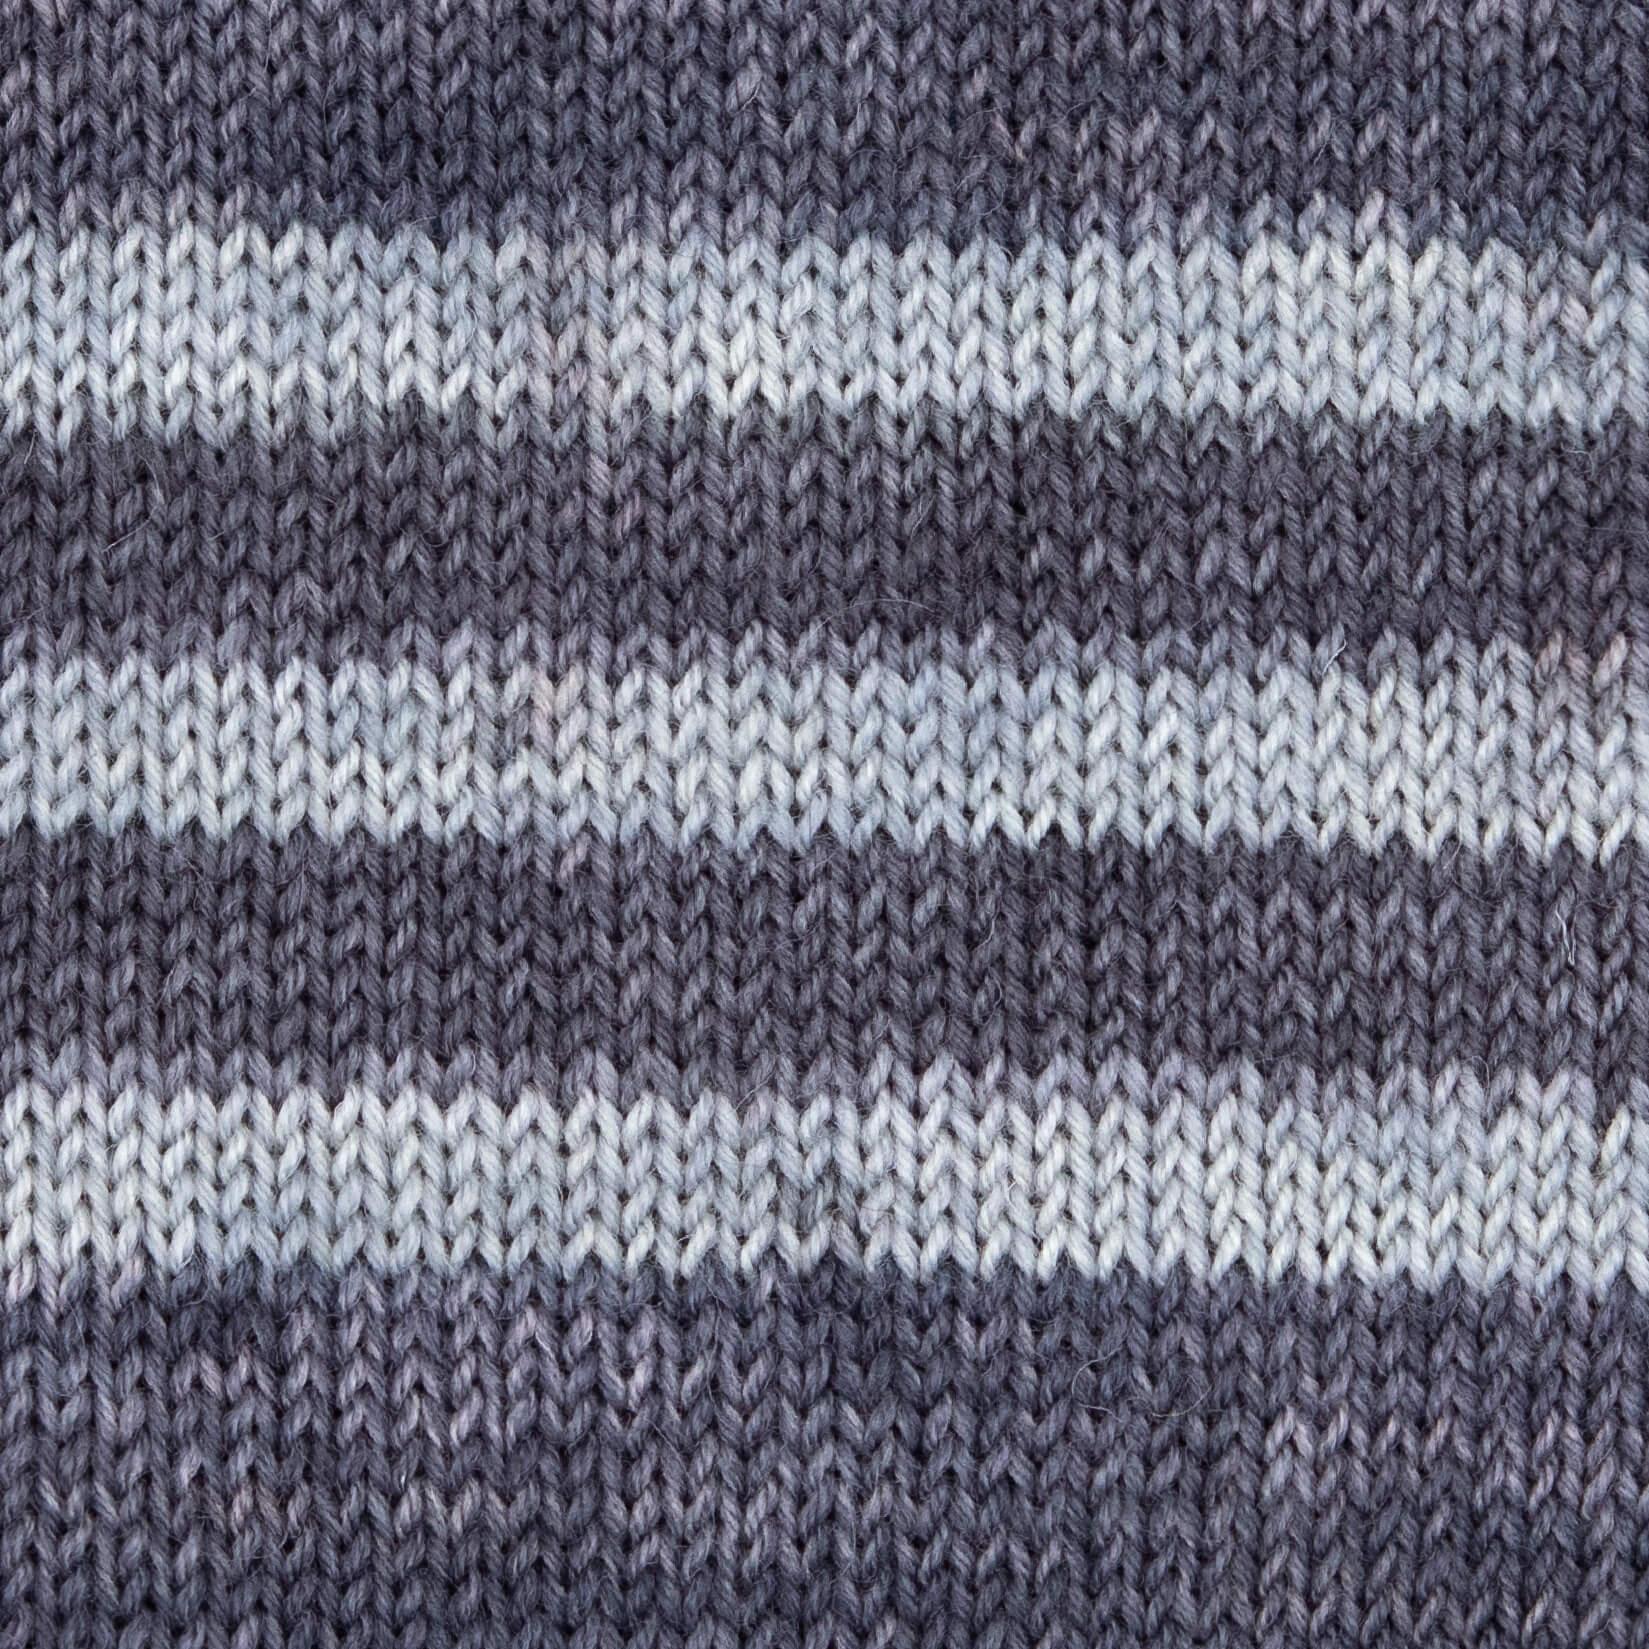 hellgrau-grau-meliert